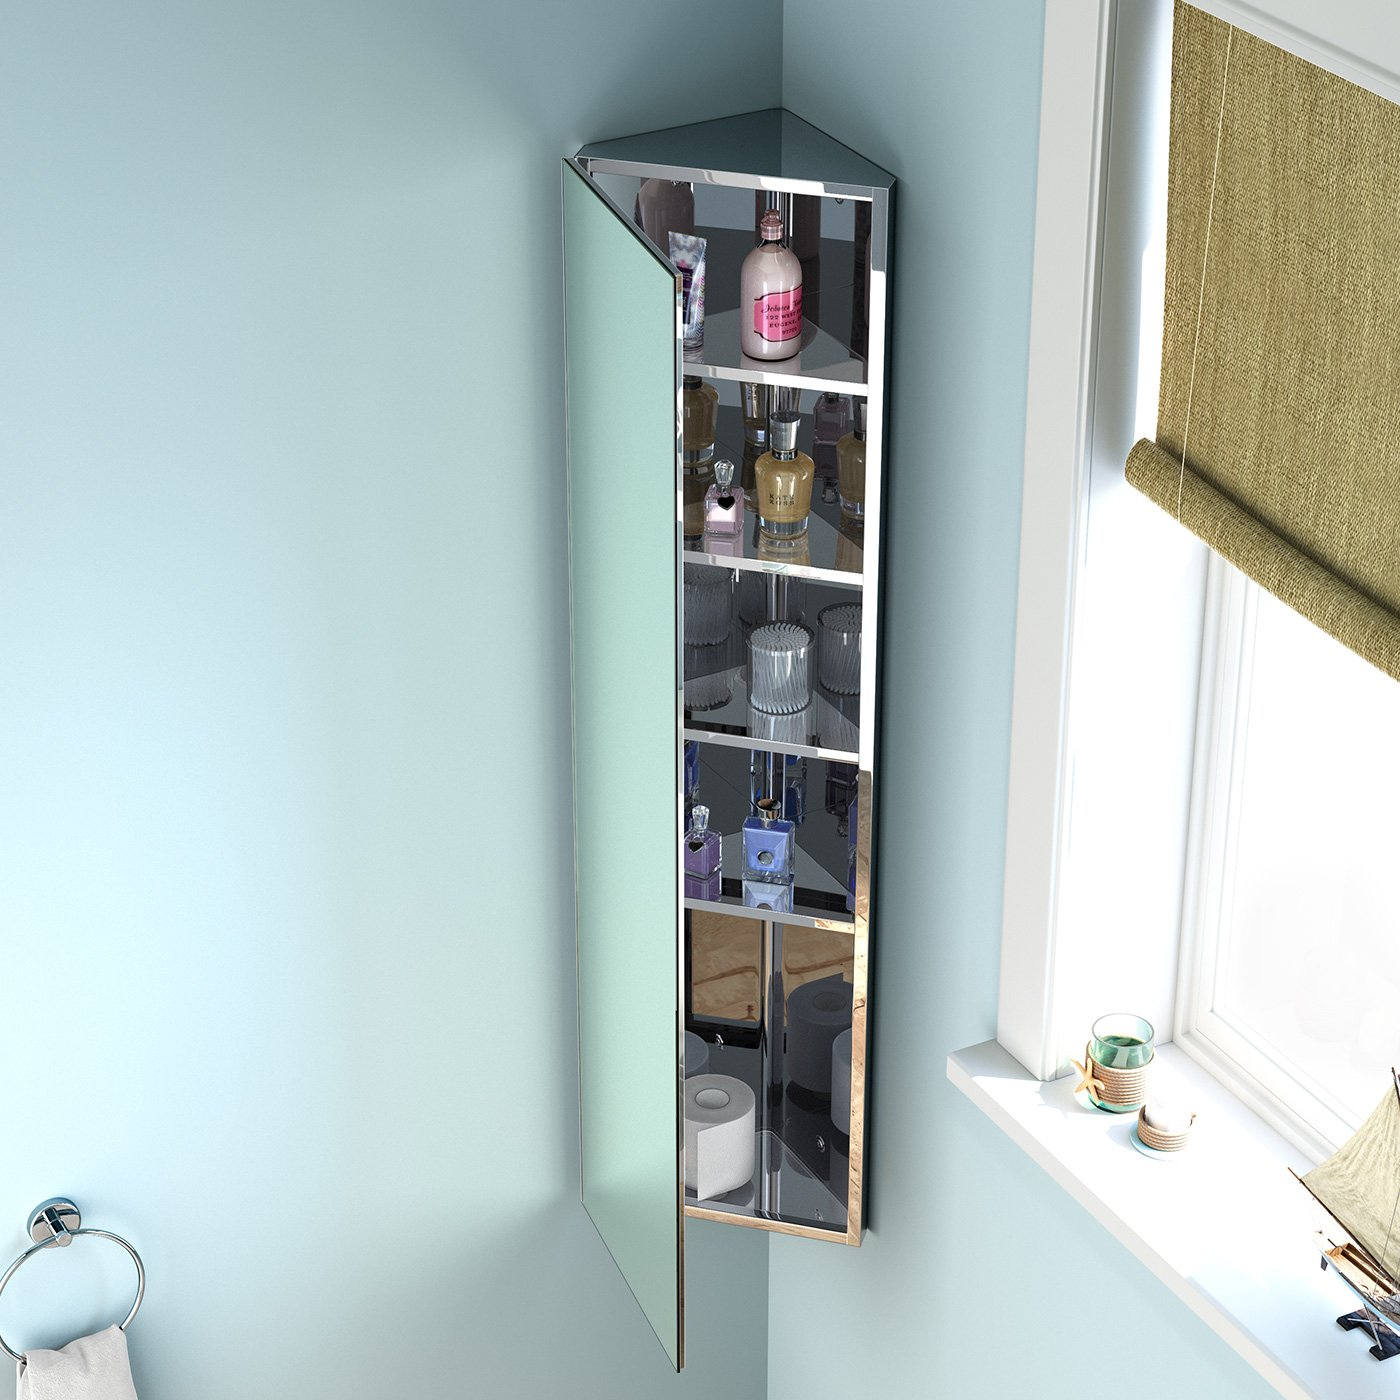 1200 X 300 Tall Stainless Steel Corner Bathroom Mirror Cabinet Modern  Storage Unit MC105: IBathUK: Amazon.co.uk: DIY U0026 Tools